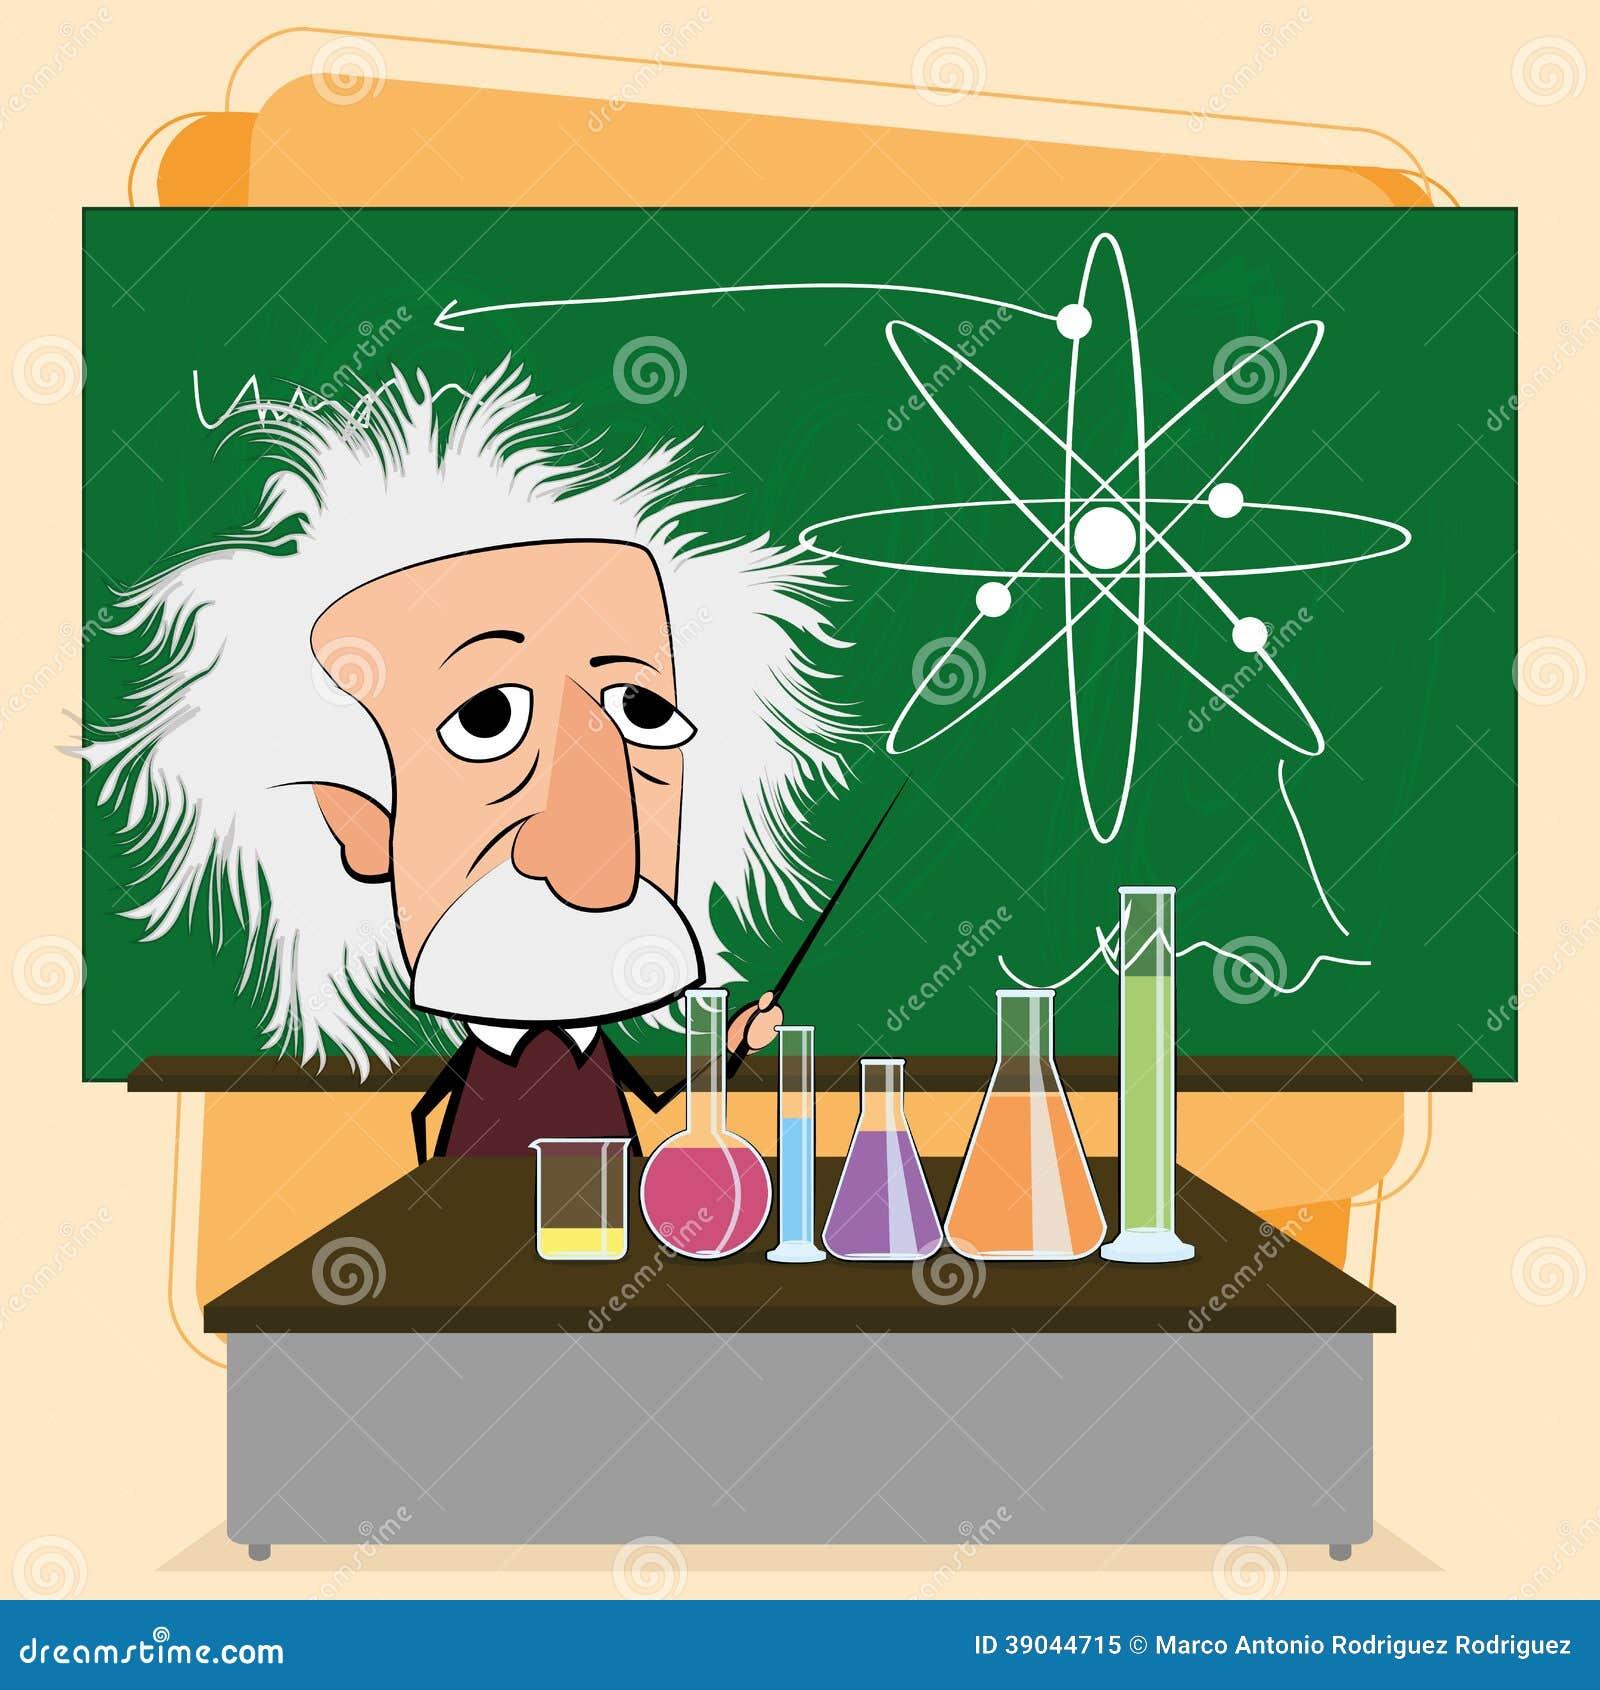 Albert Einstein Cartoon In A Classroom Scene Stock Vector - Image ...